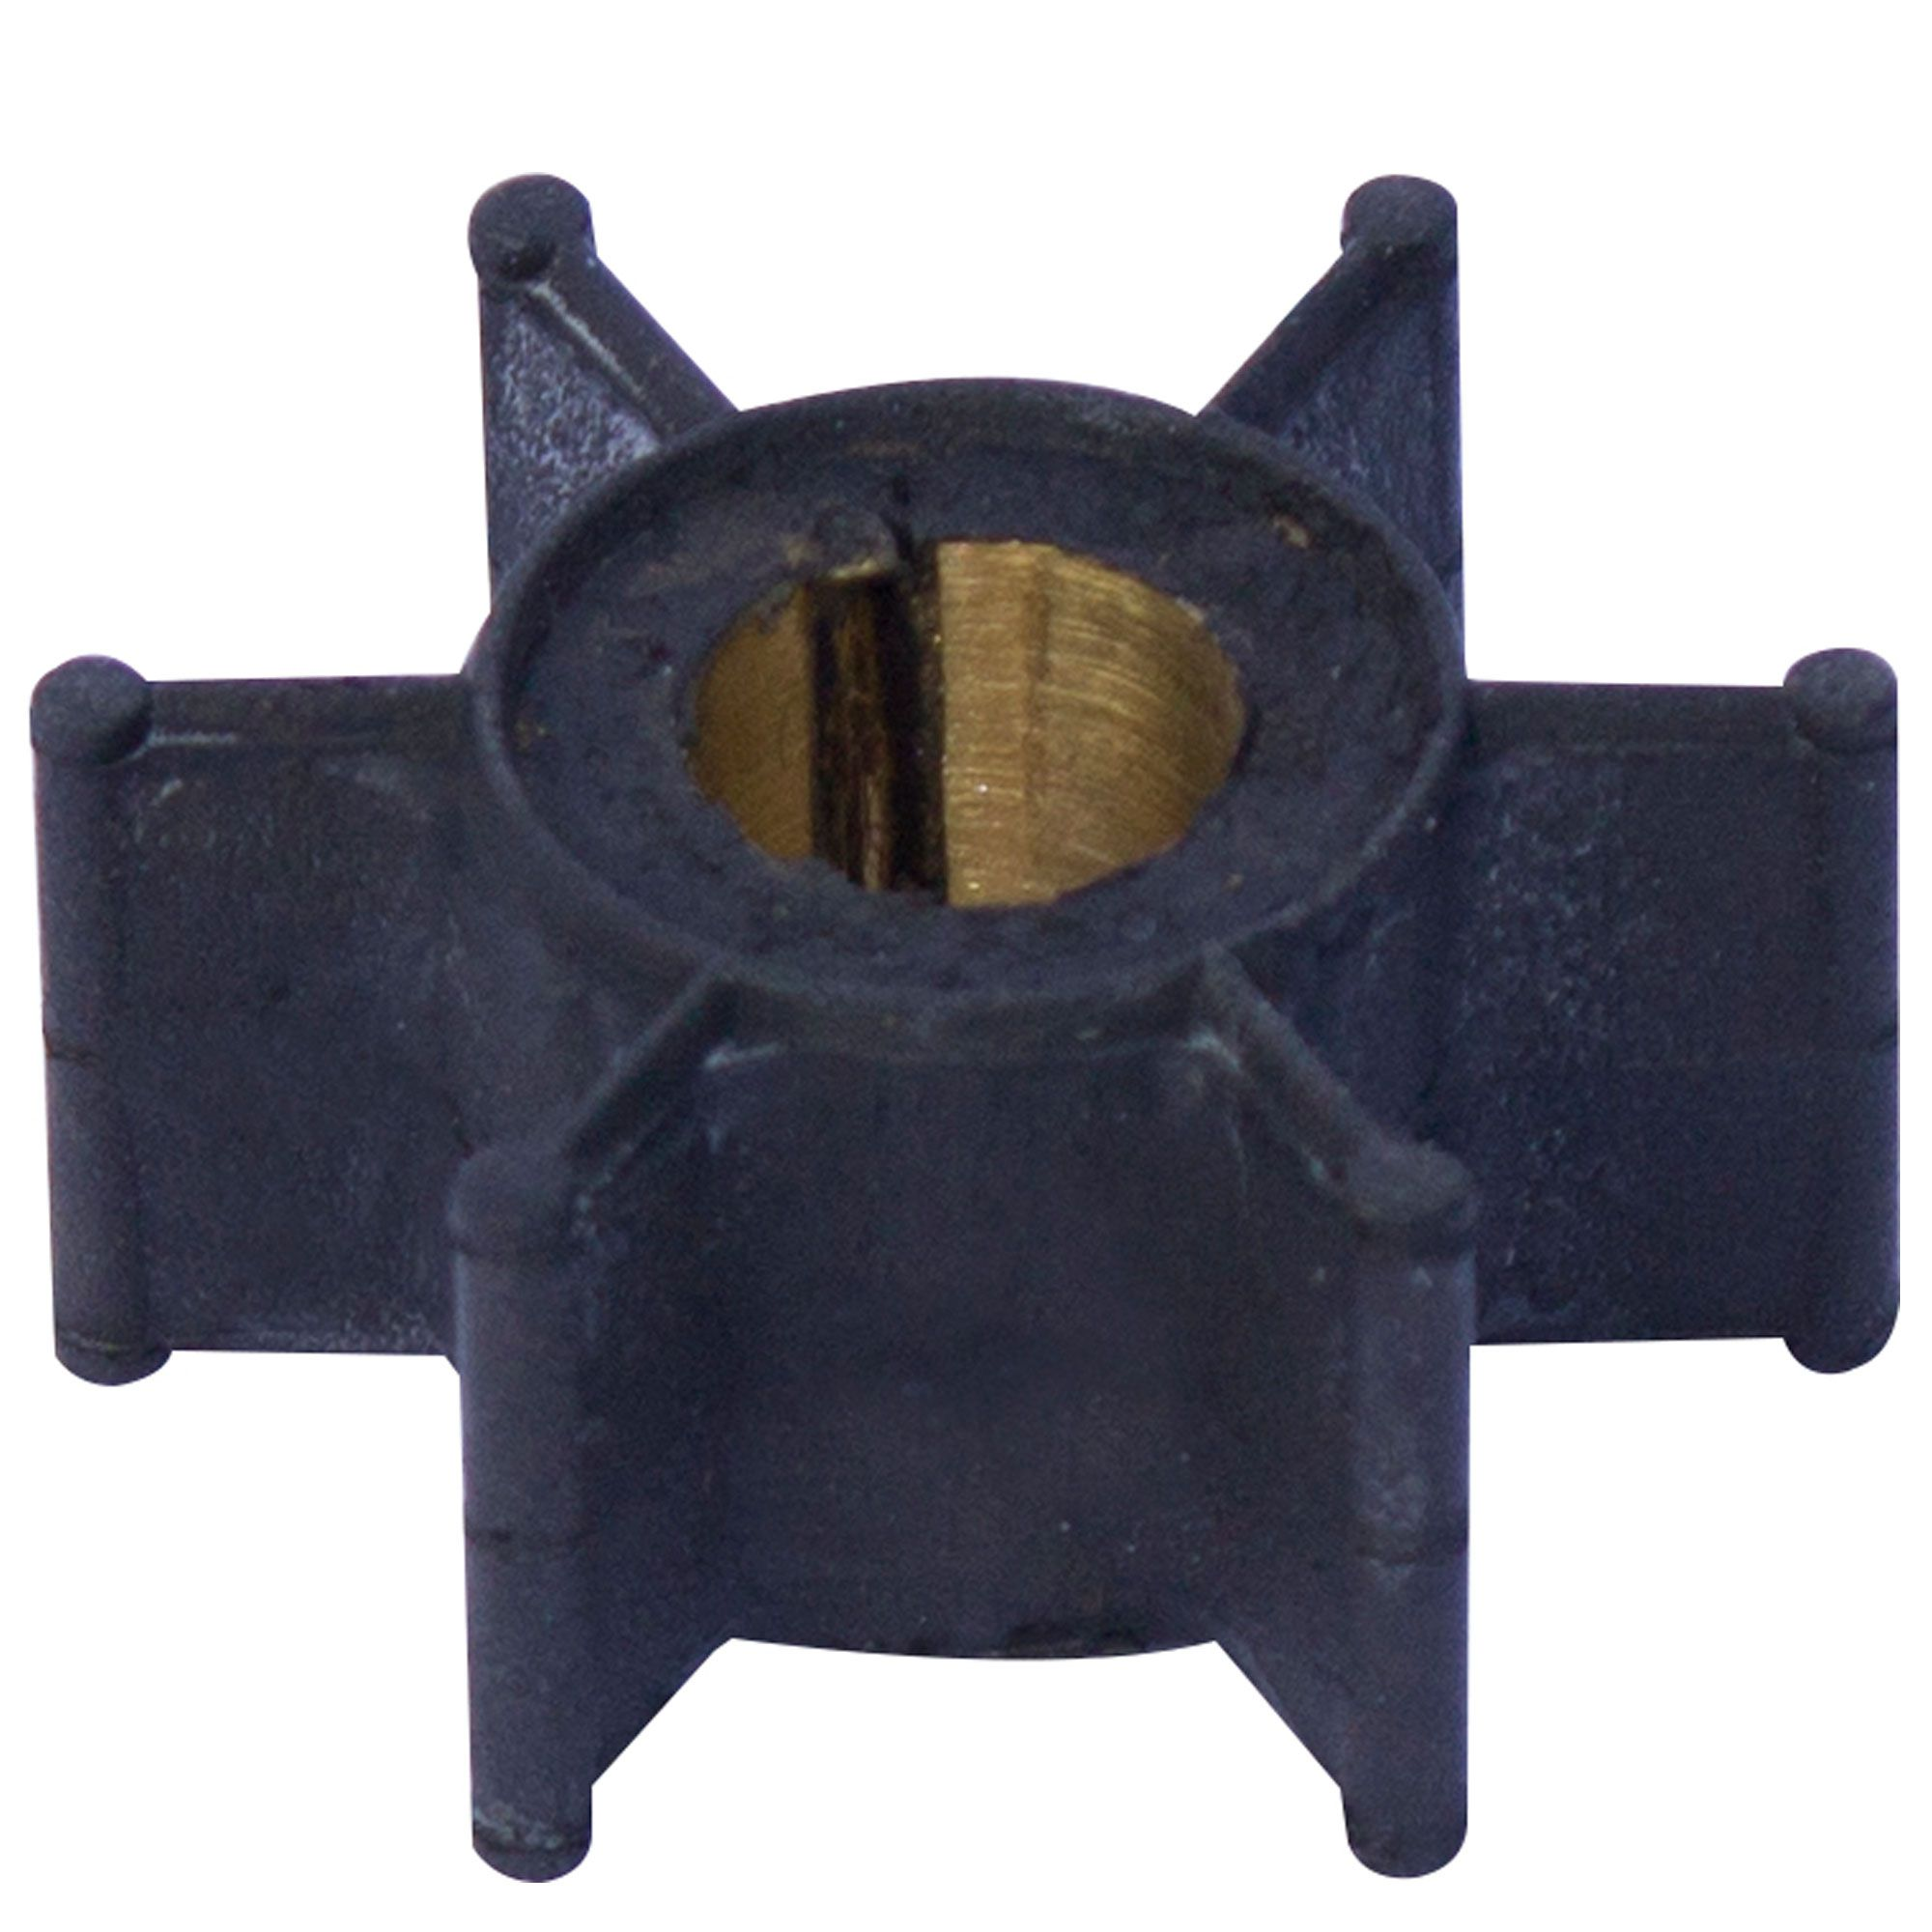 Rotor 44 x 17 x 20mm